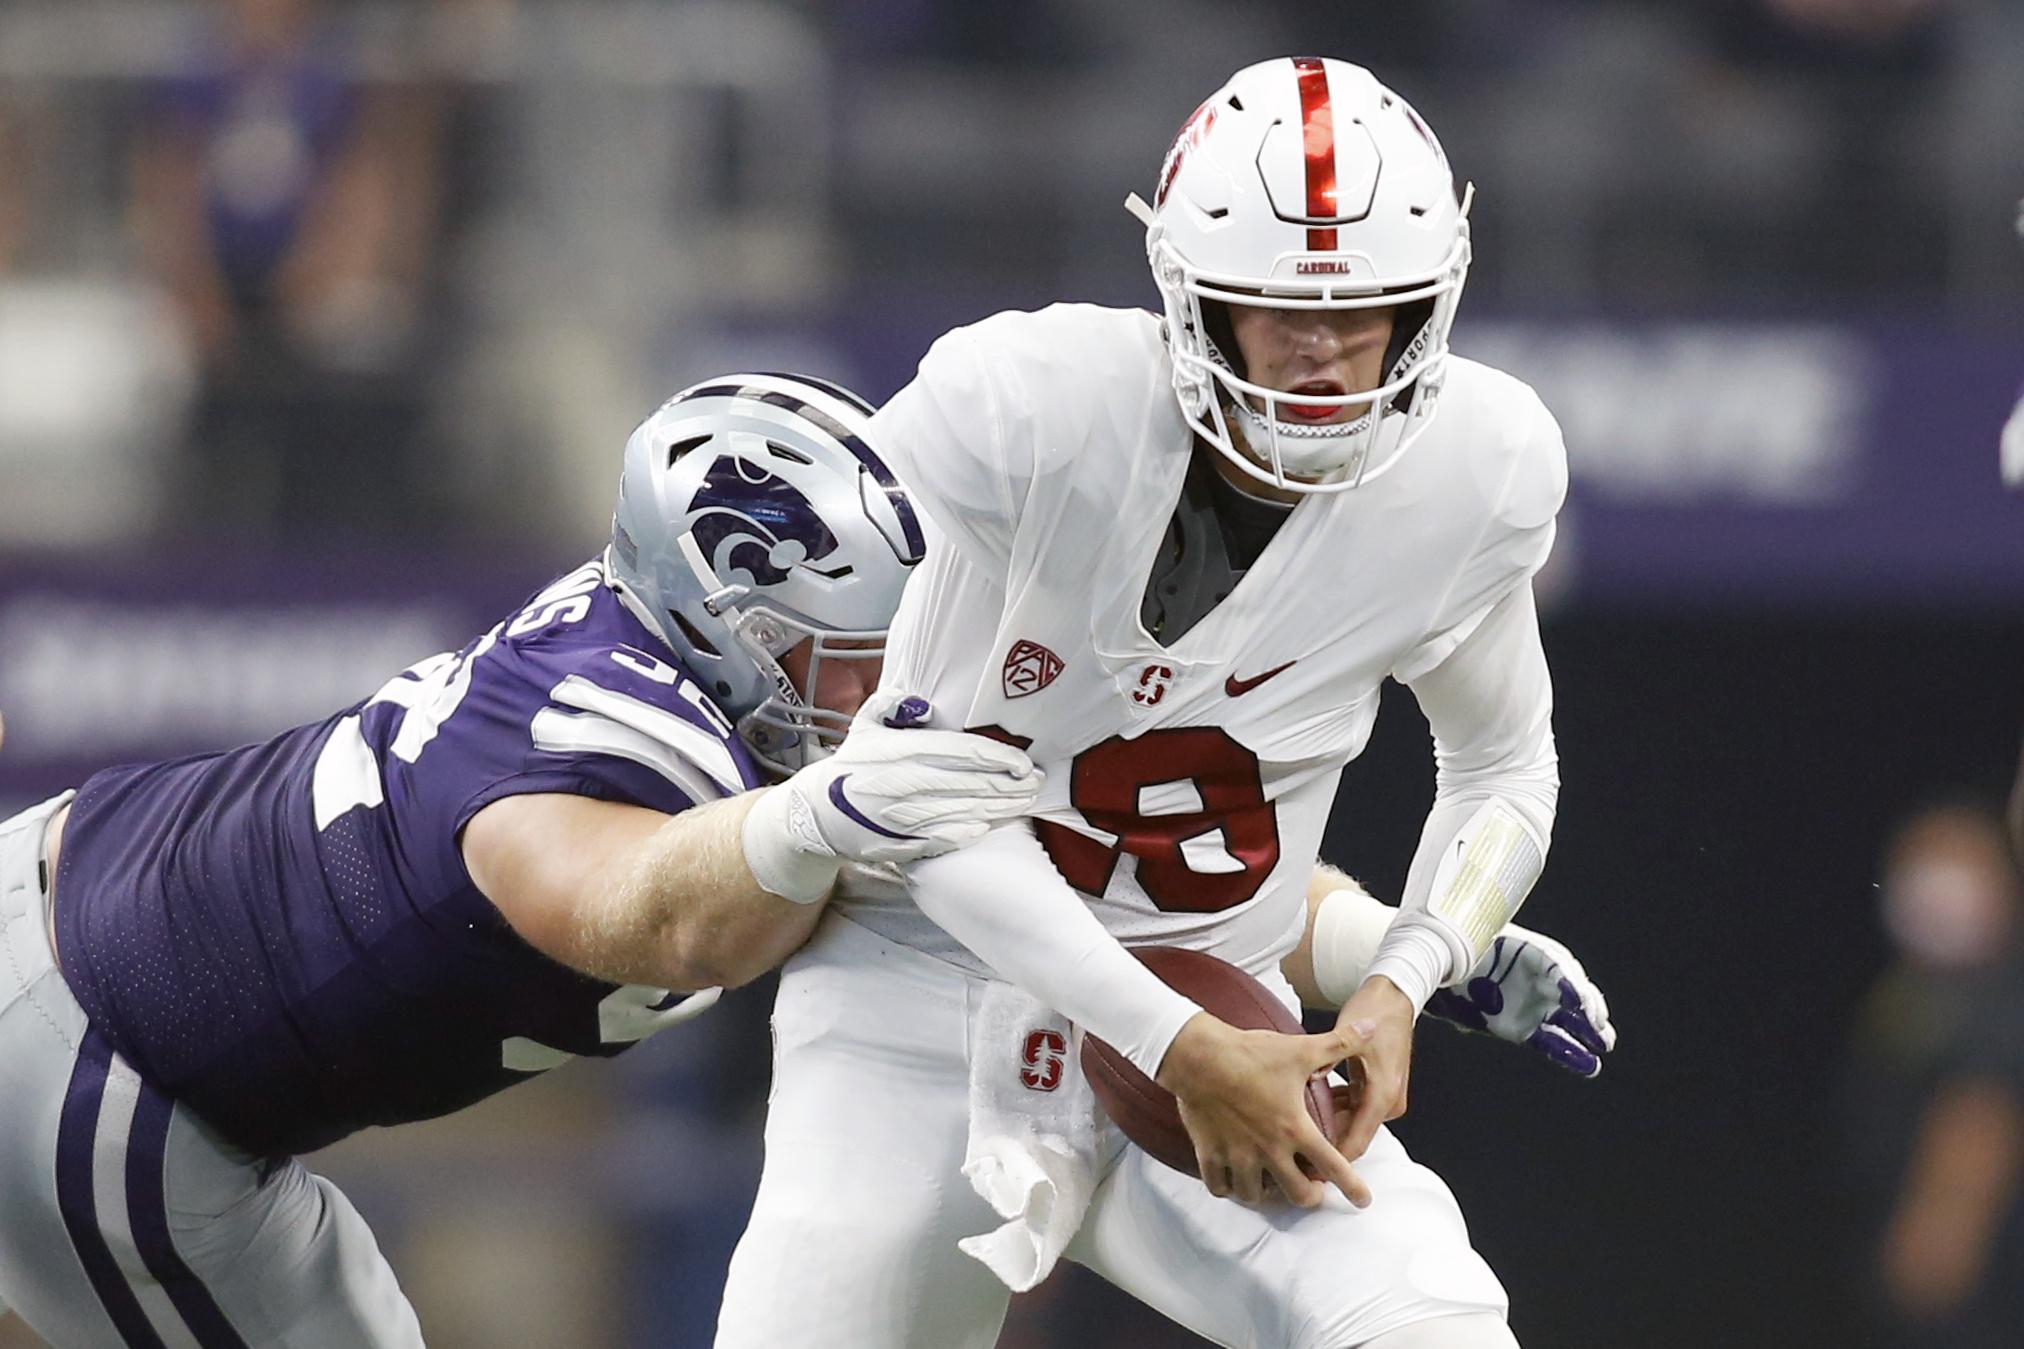 NCAA Football: Stanford at Kansas State